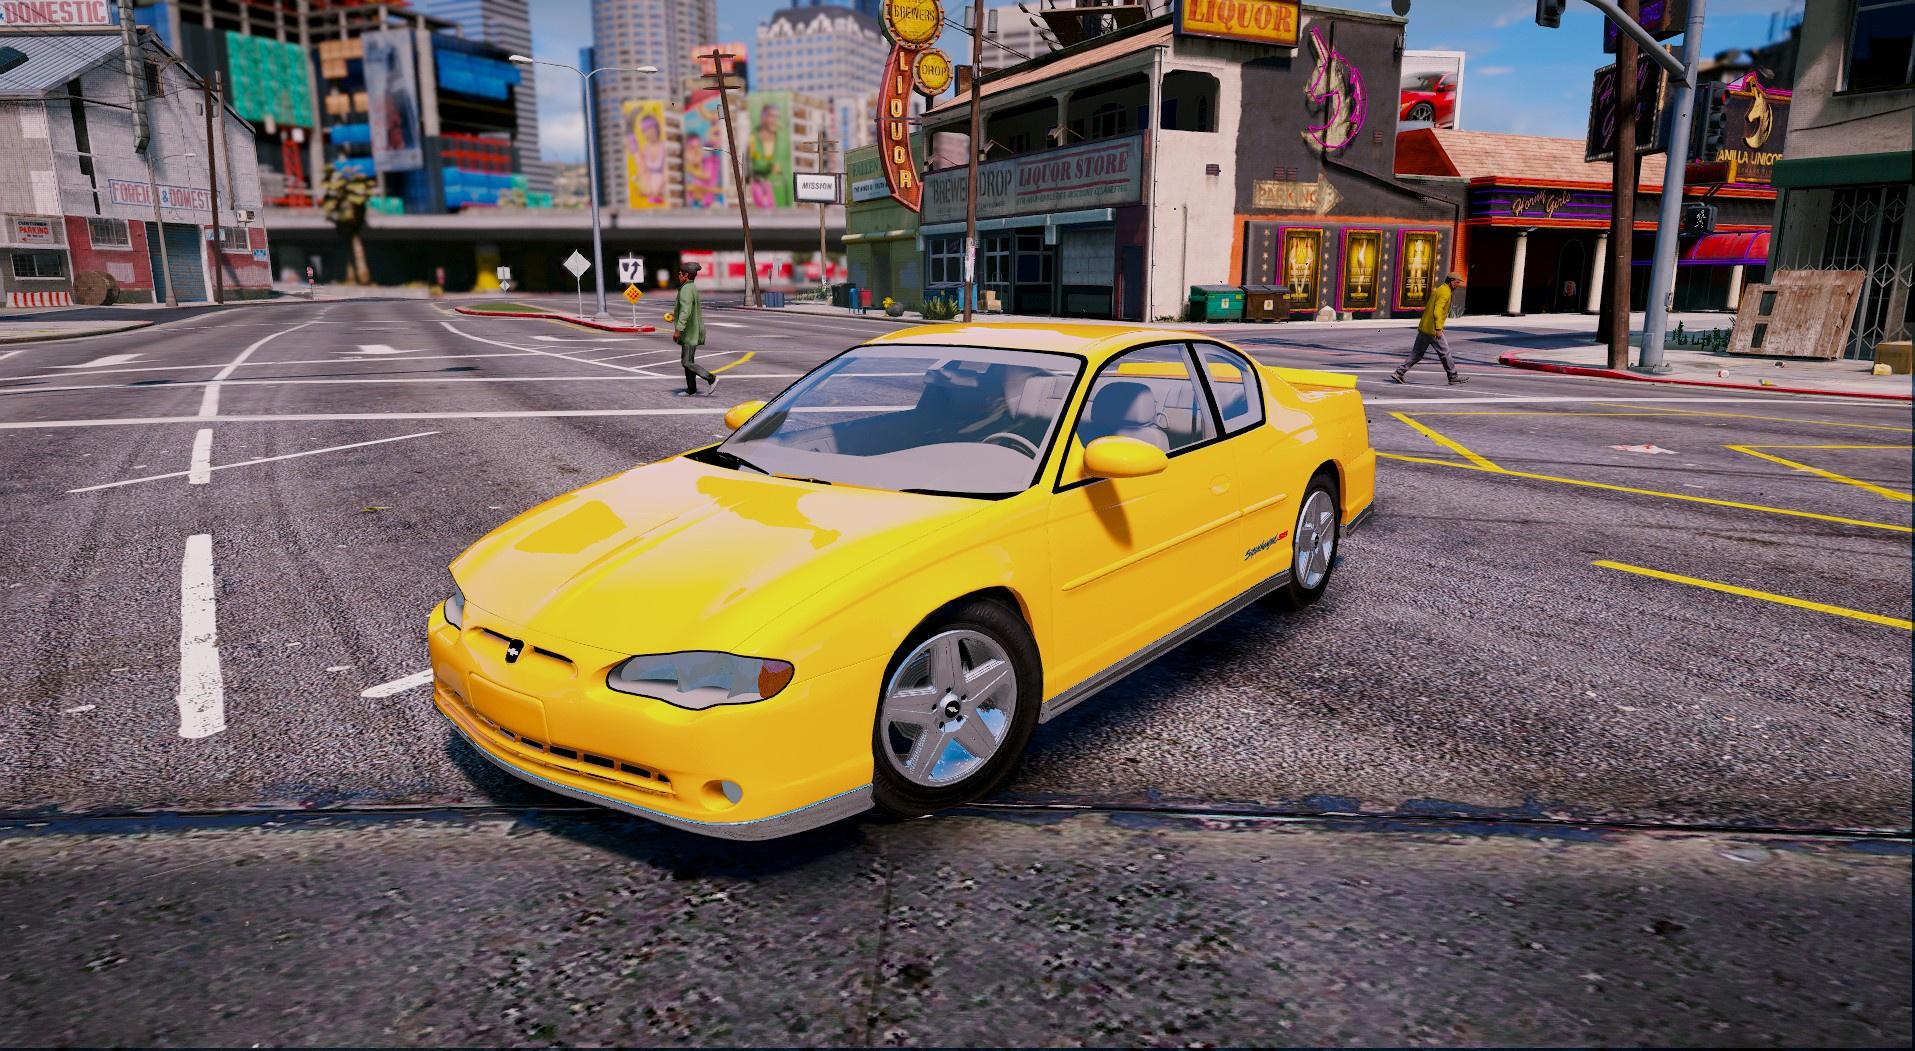 2004 Chevrolet Monte Carlo GTA5 Mods